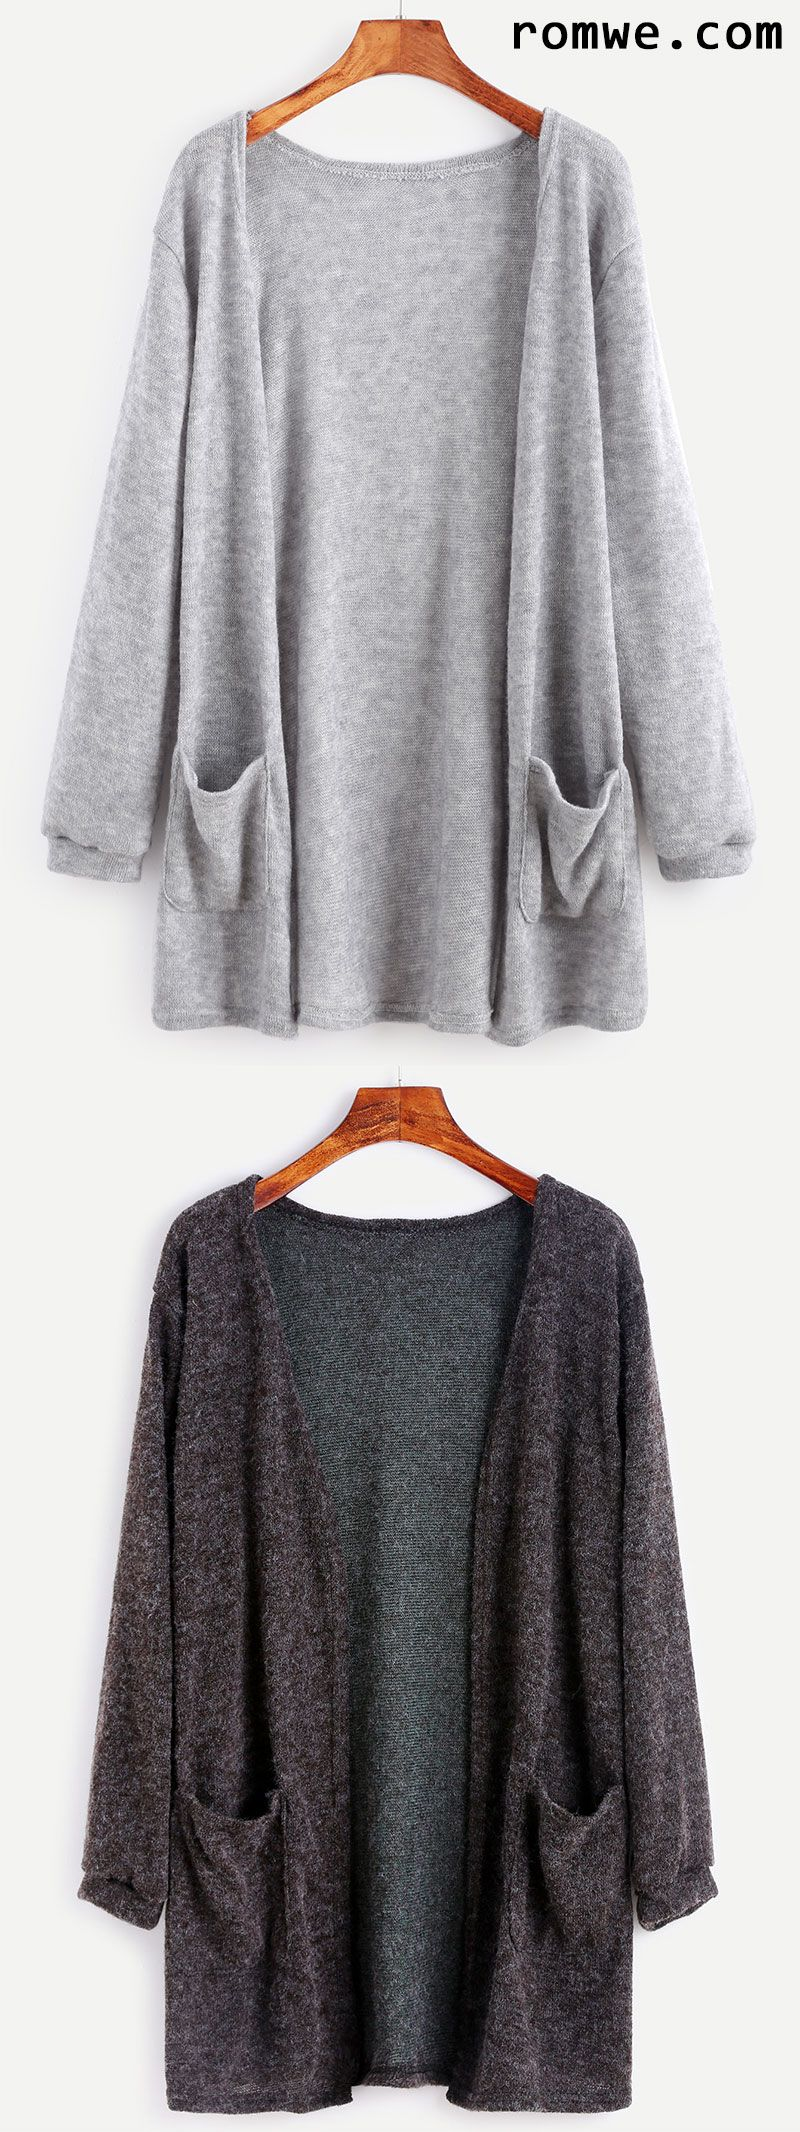 Elastic Cuff Cardigan With Pockets | Romwe Hot Buy | Pinterest ...